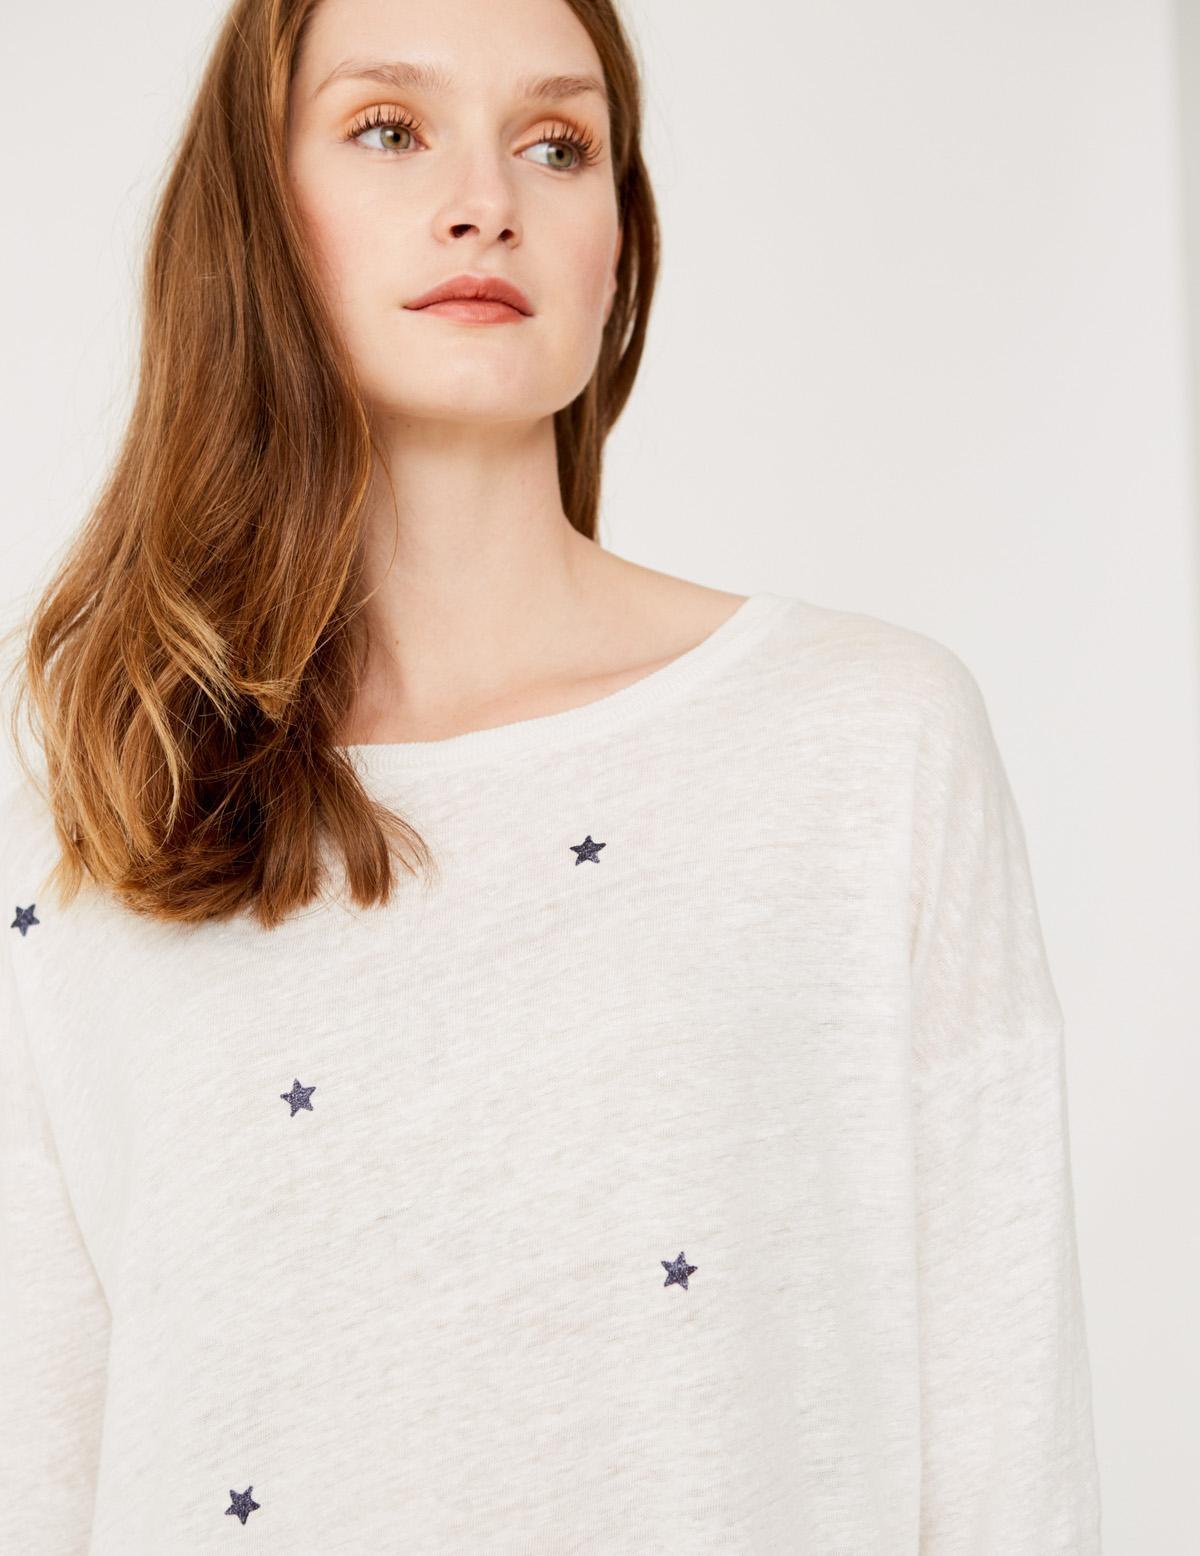 Camiseta estampado estrellas - Ítem1